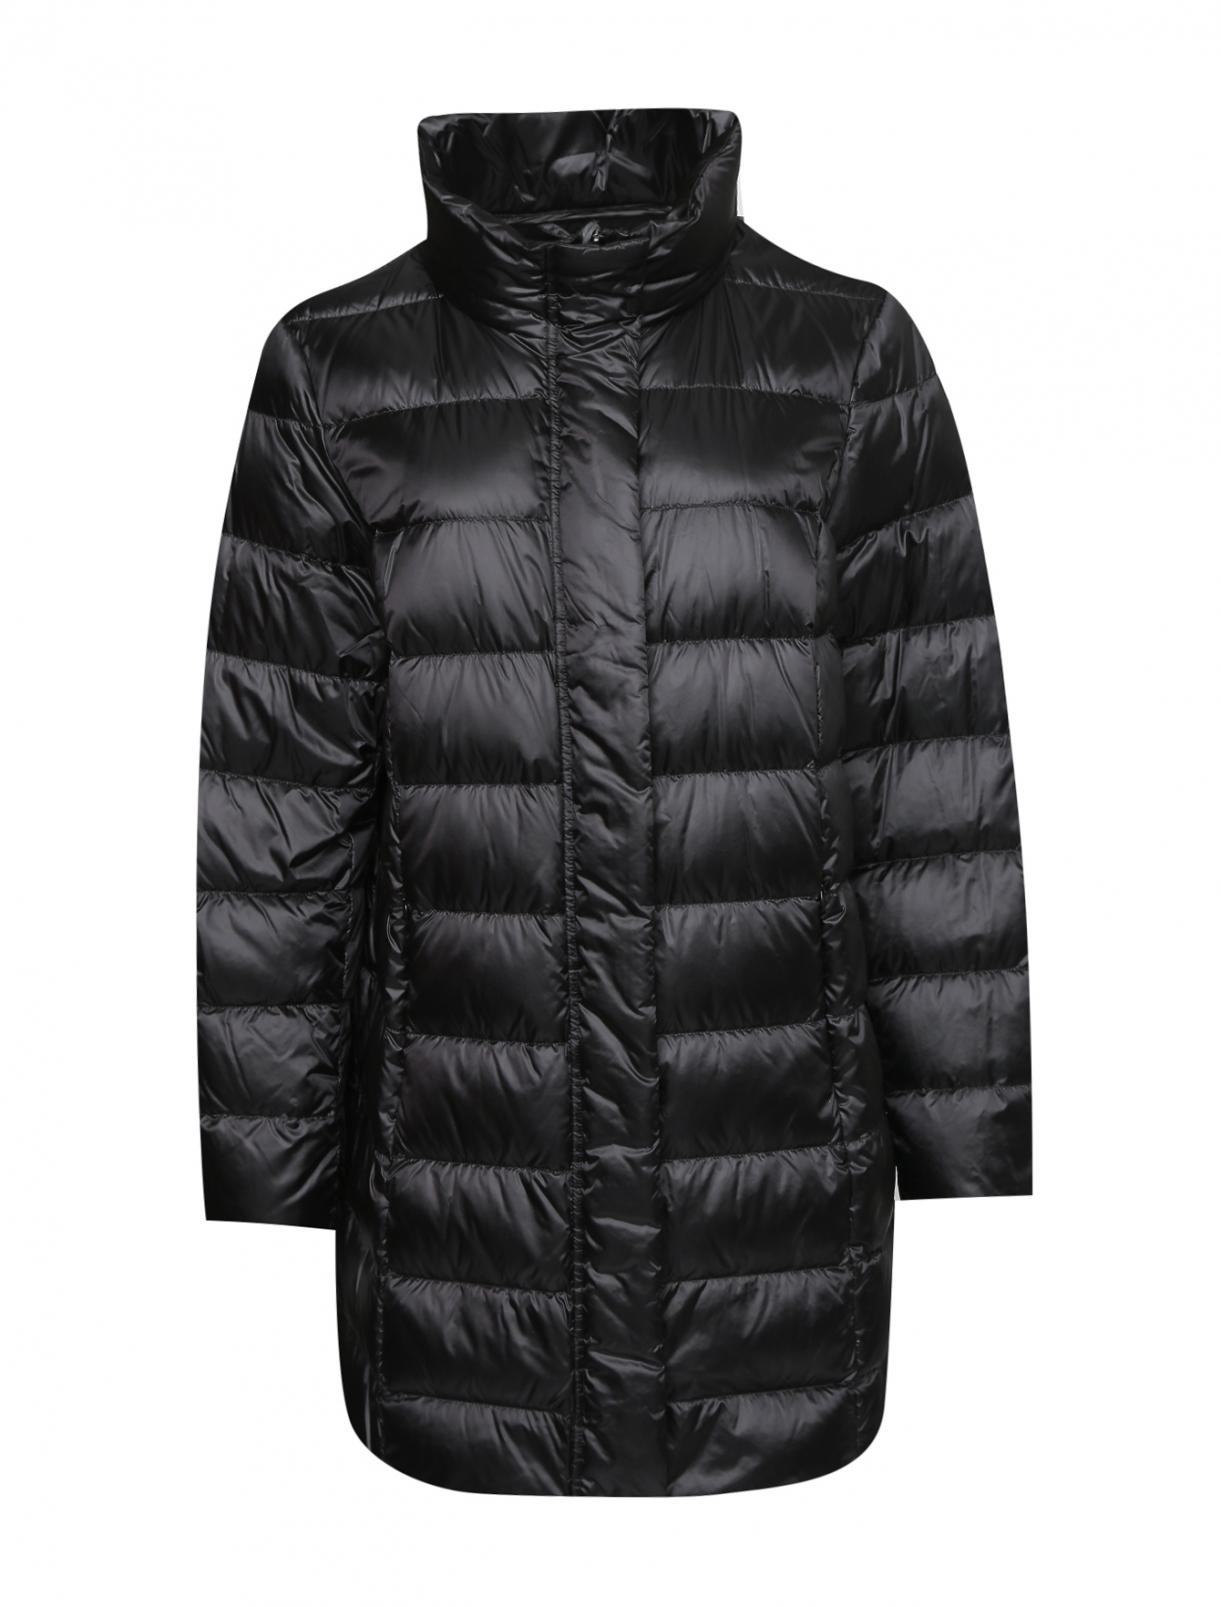 Стеганая куртка на молнии Persona by Marina Rinaldi  –  Общий вид